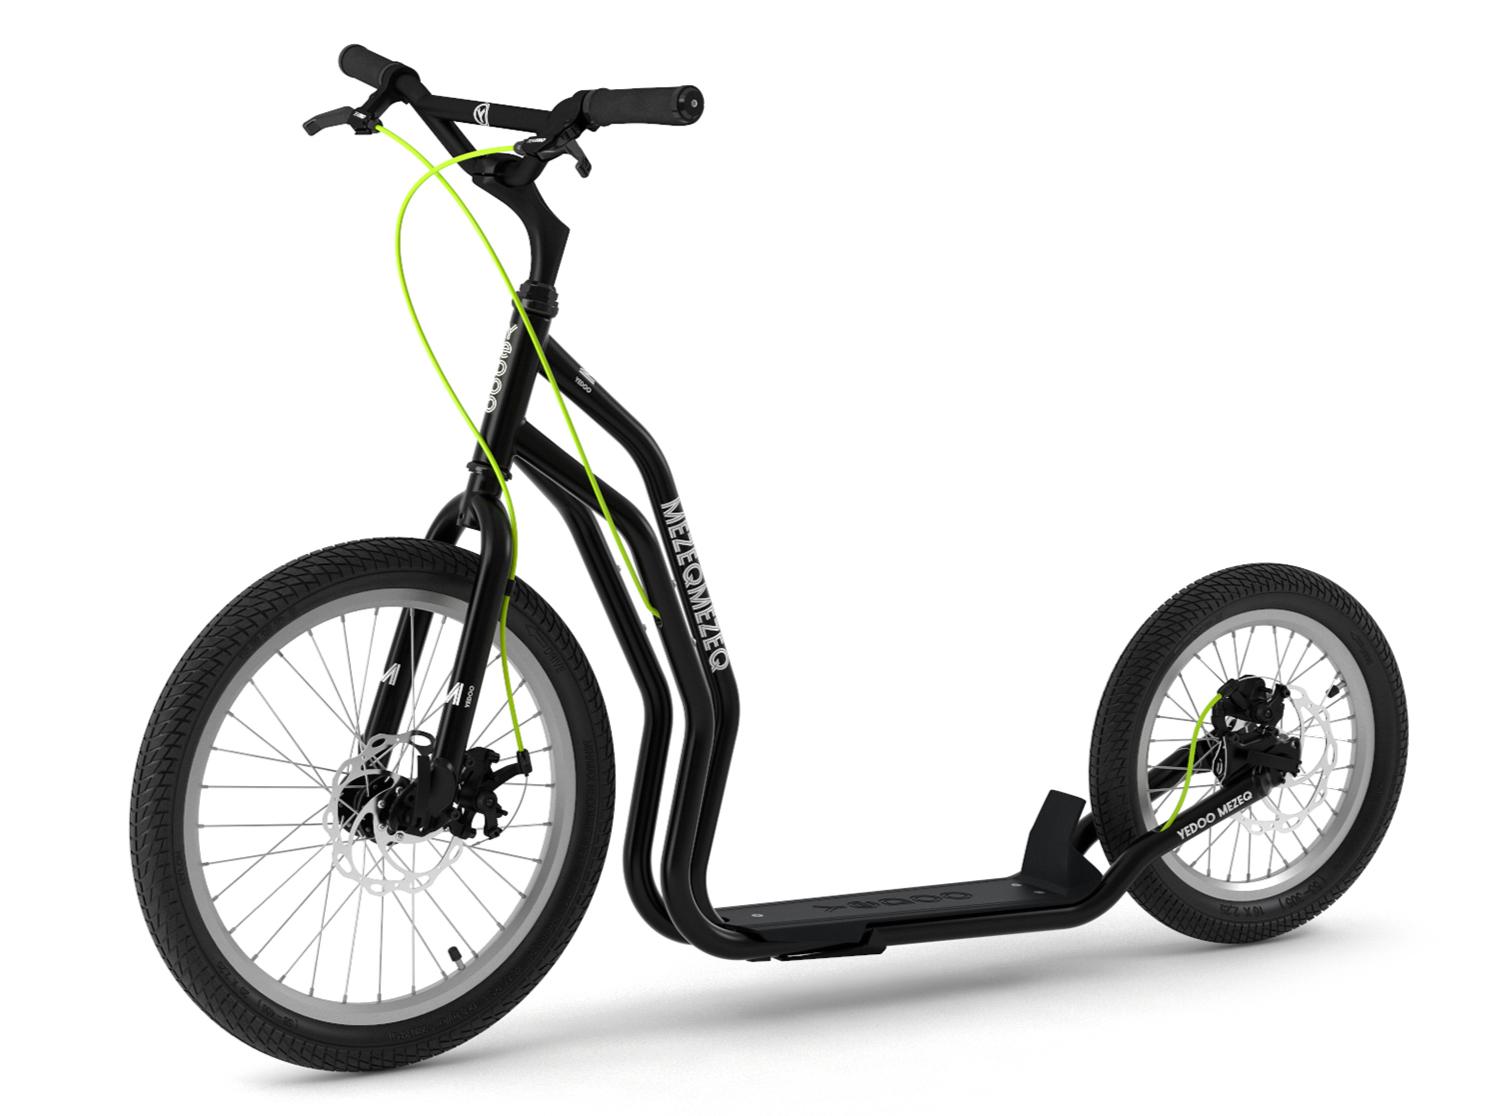 patinette new mezeq yedoo noire grande roues cross traction chien